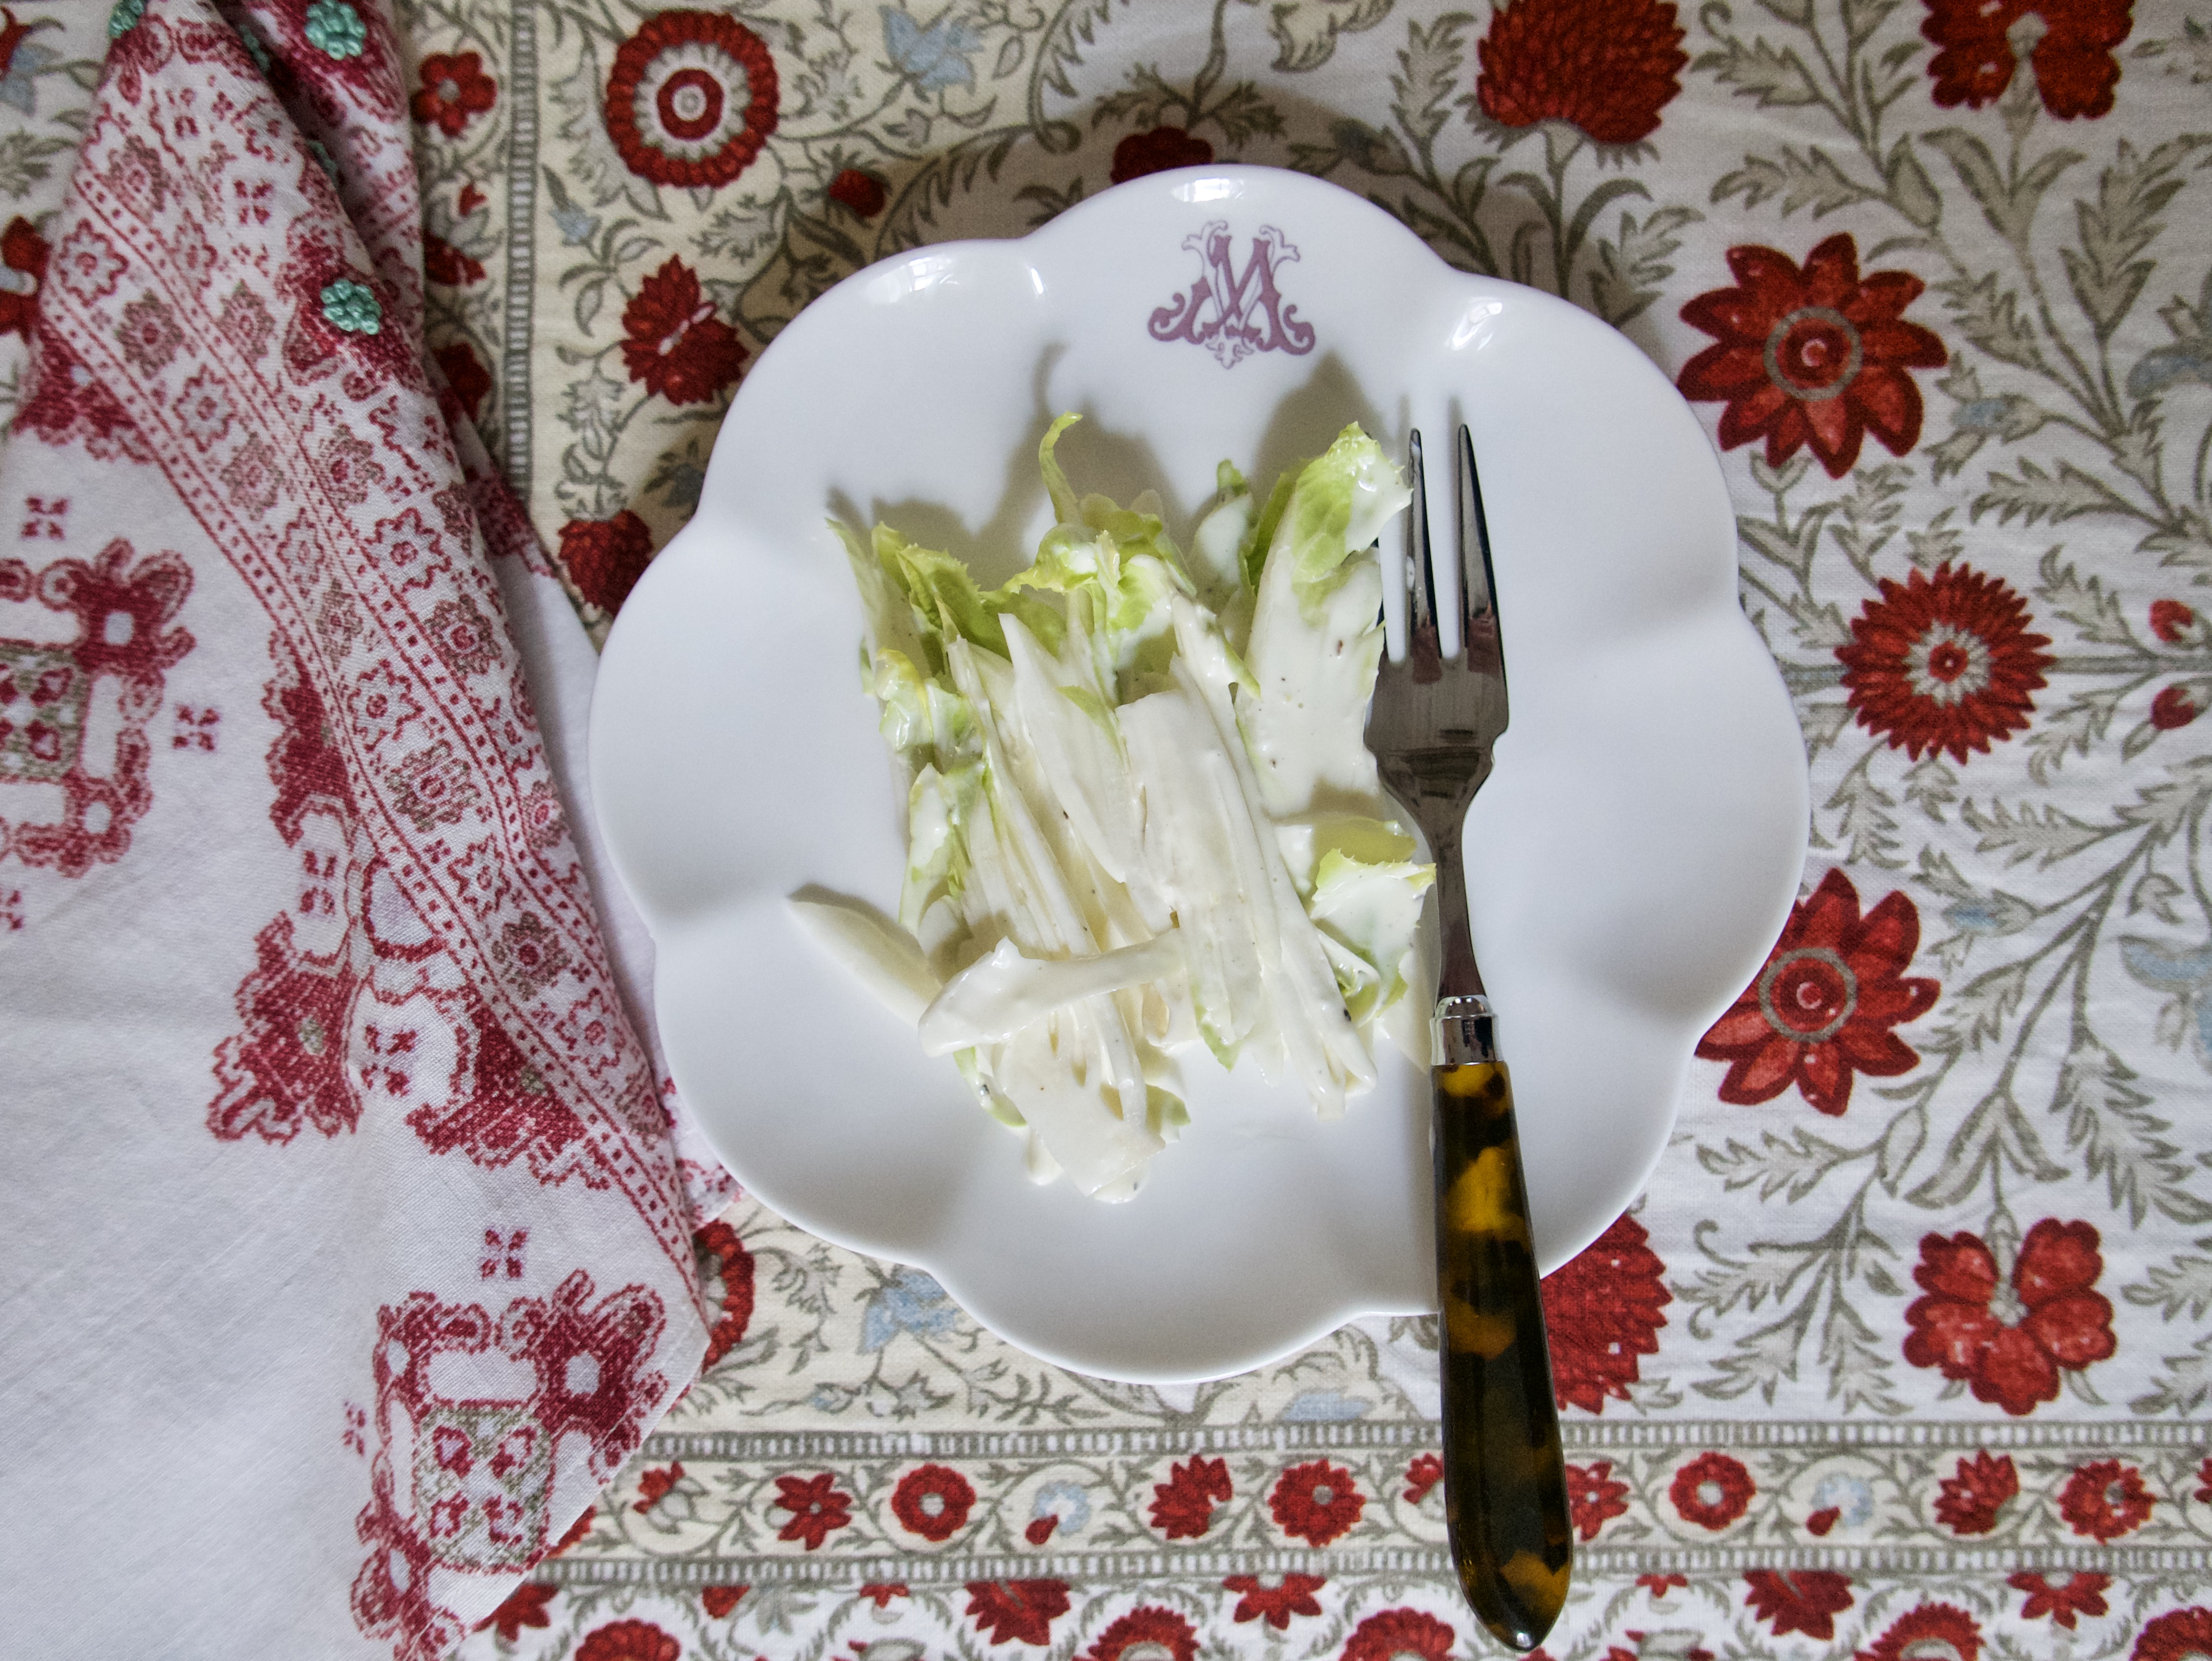 endive salad with vinaigrette